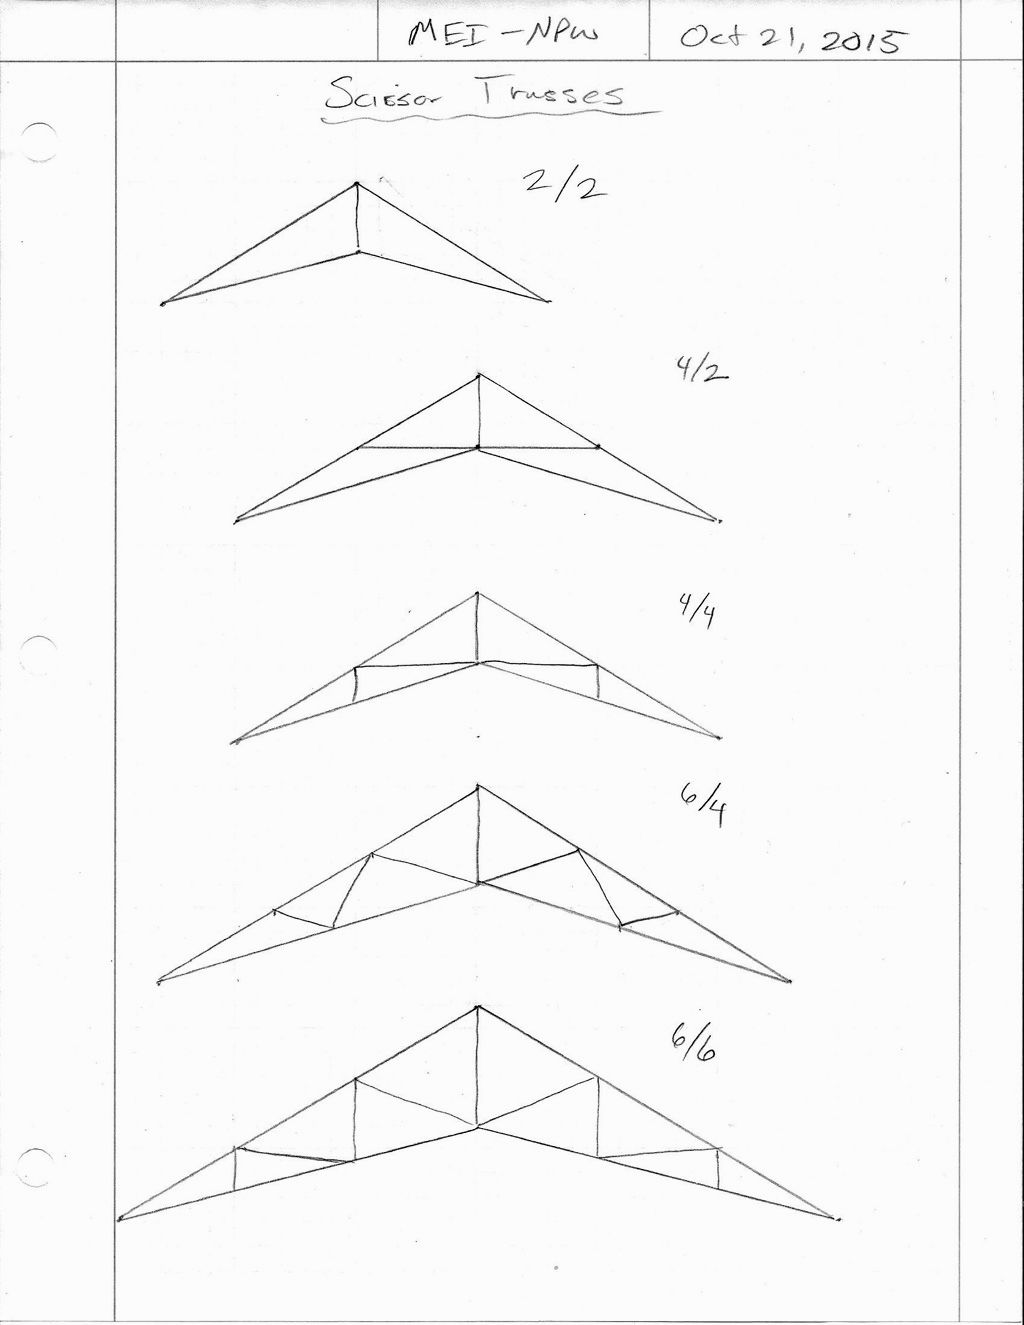 1024x1325 terrific scissor truss design calculator portrait gallery image